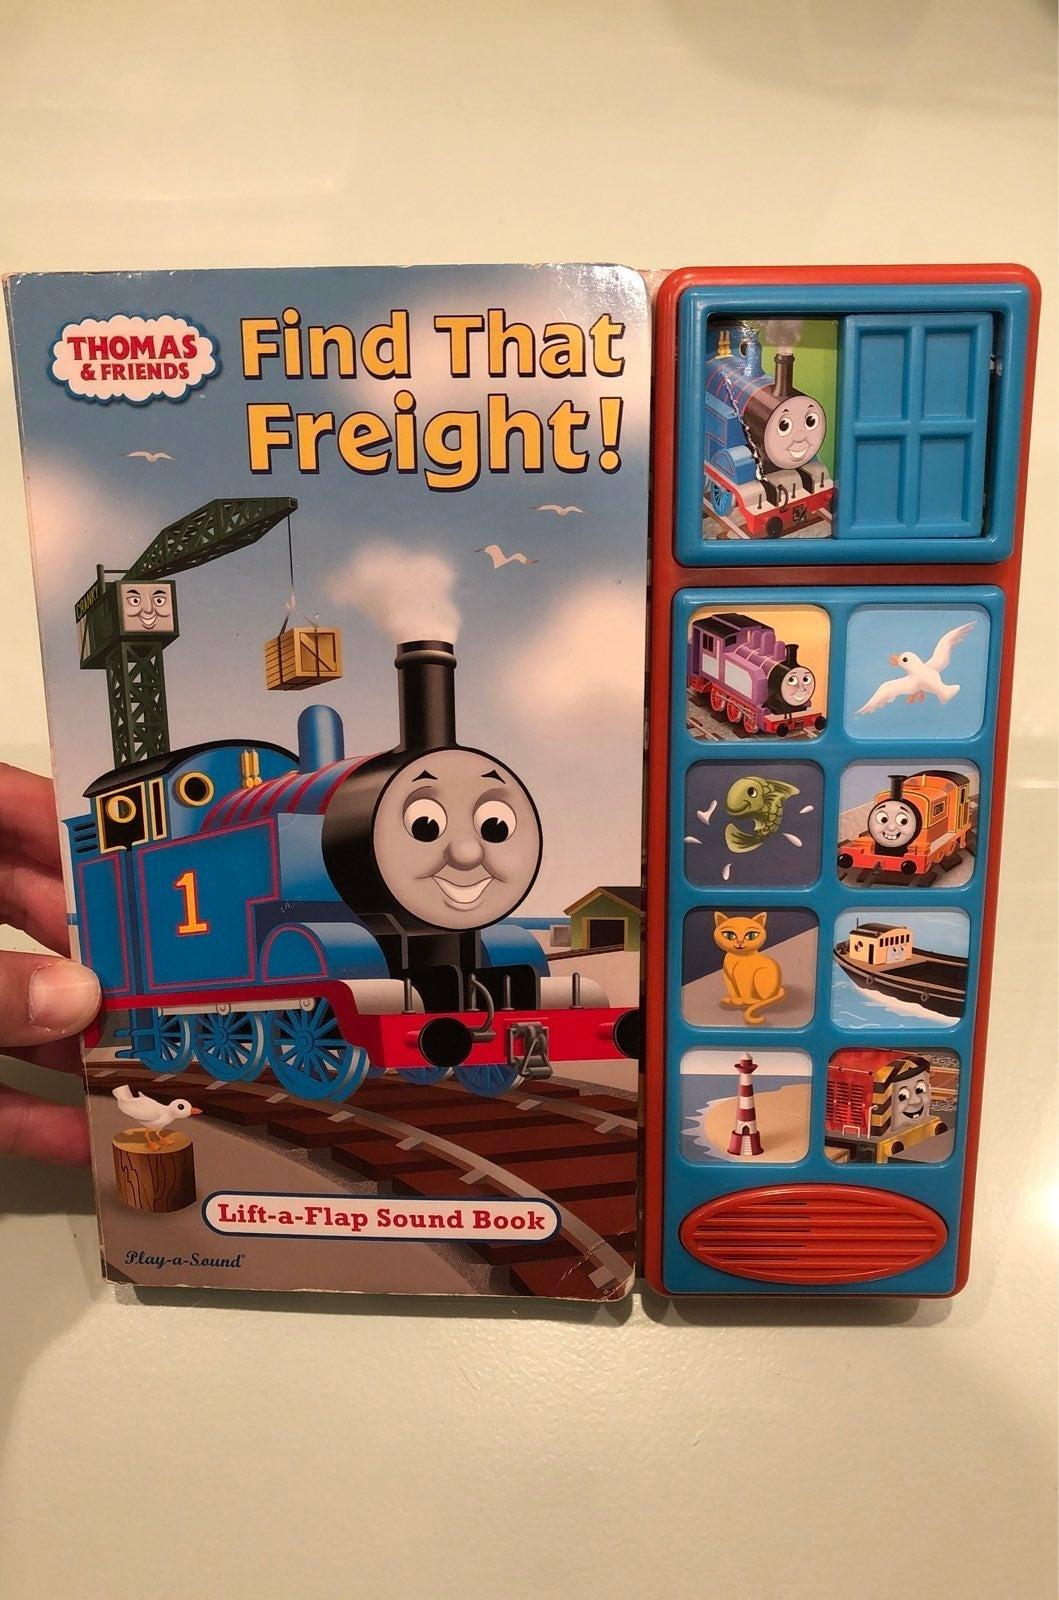 Thomas & Friends lift flap sound book